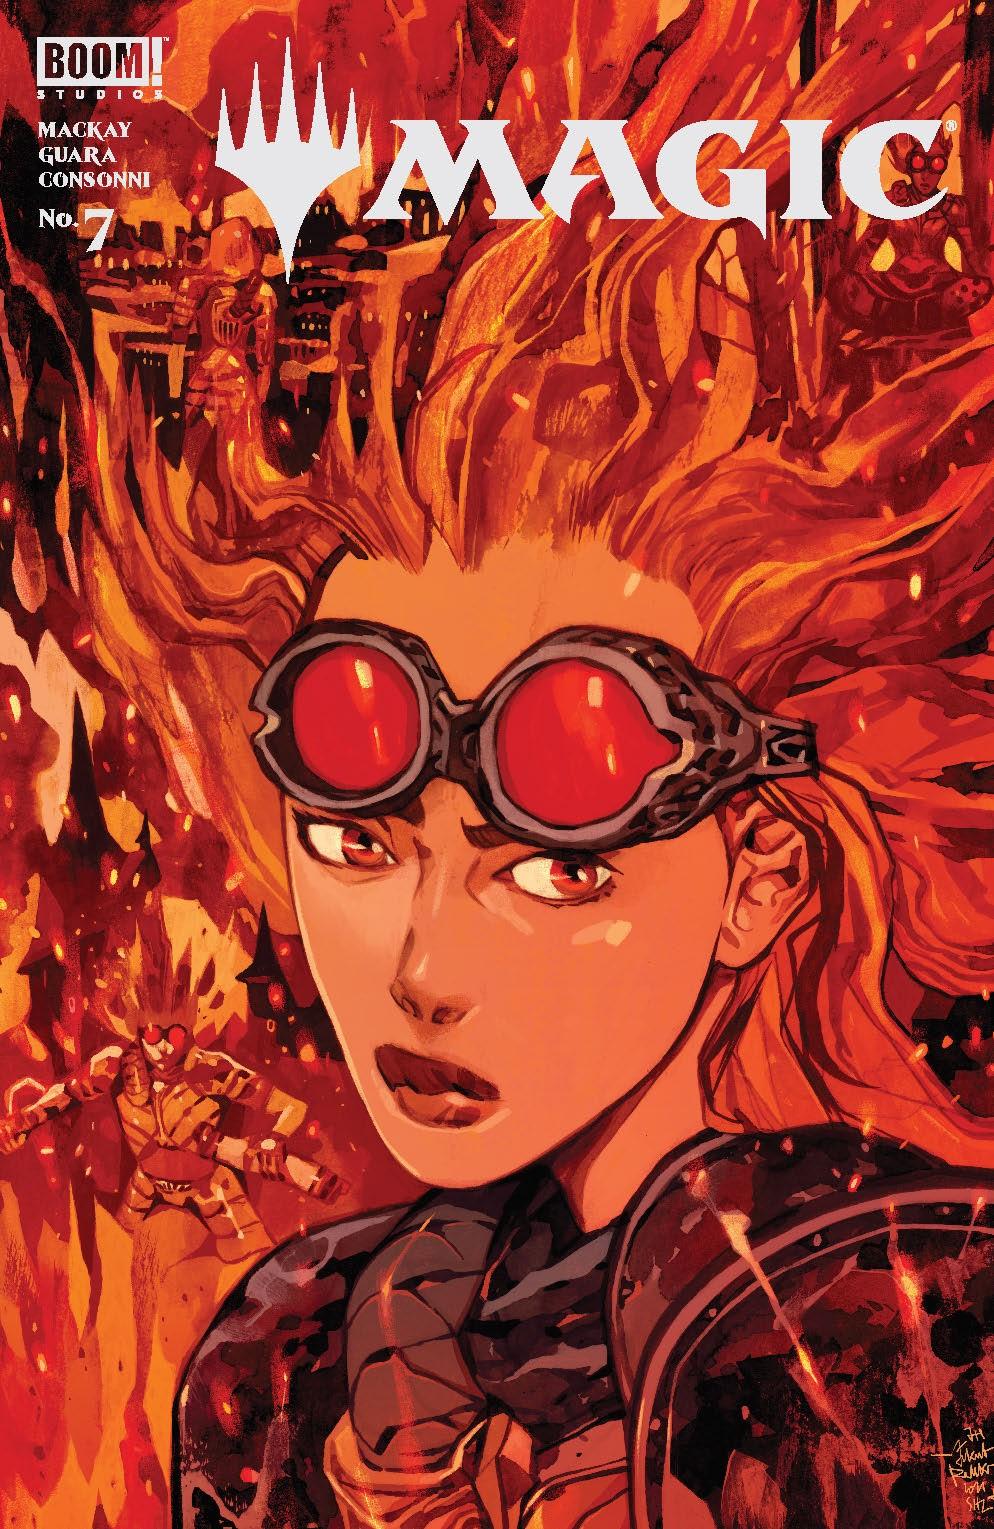 Magic_007_Cover_C1_HiddenSpark ComicList: BOOM! Studios New Releases for 10/06/2021